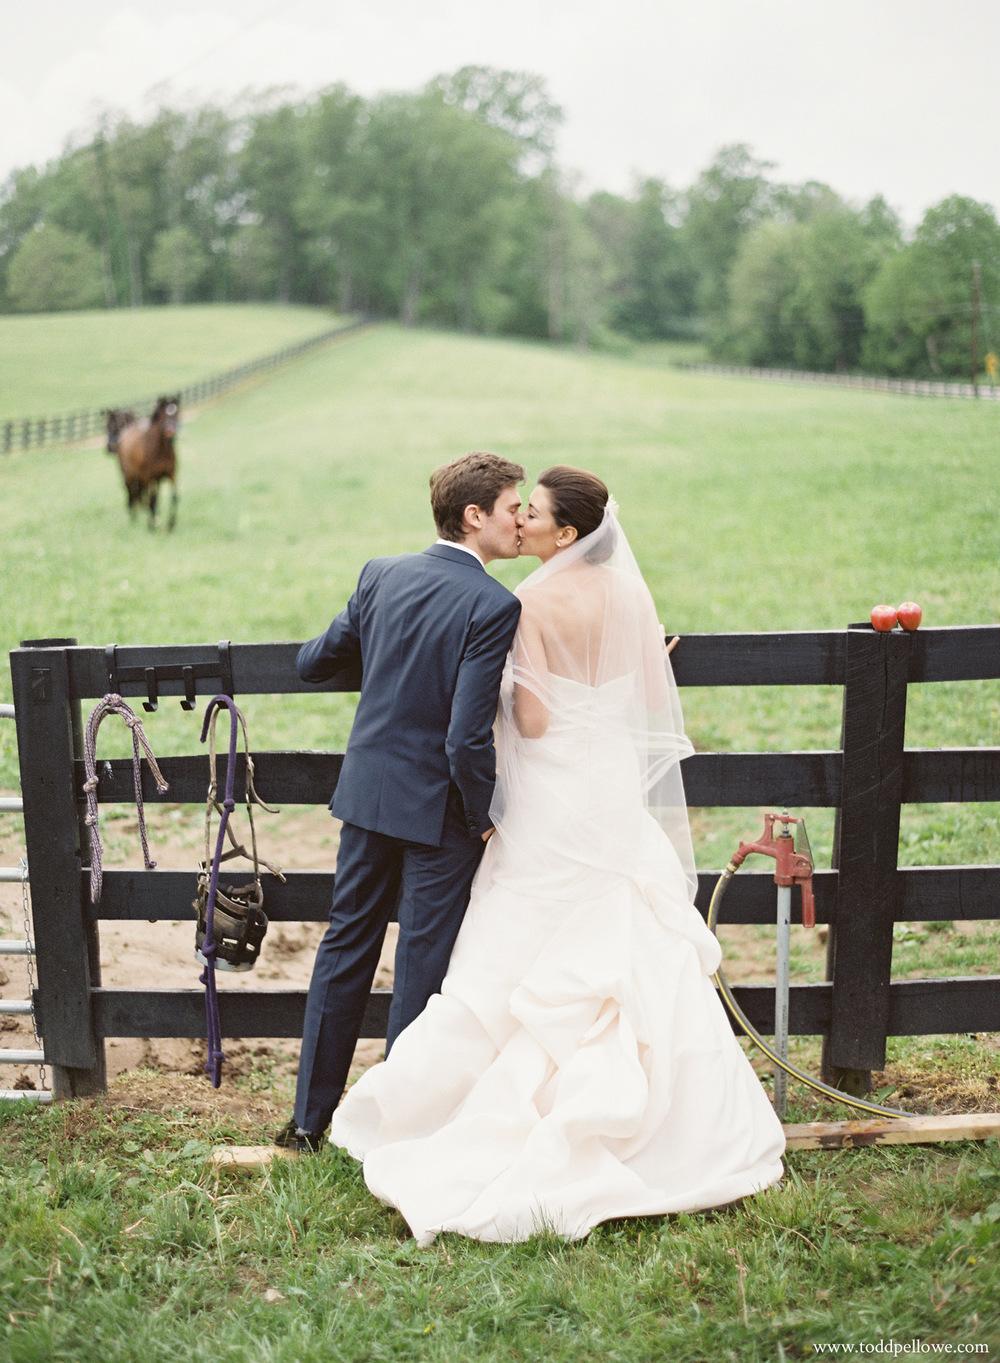 34-kentucky-farm-wedding-photography-008.jpg